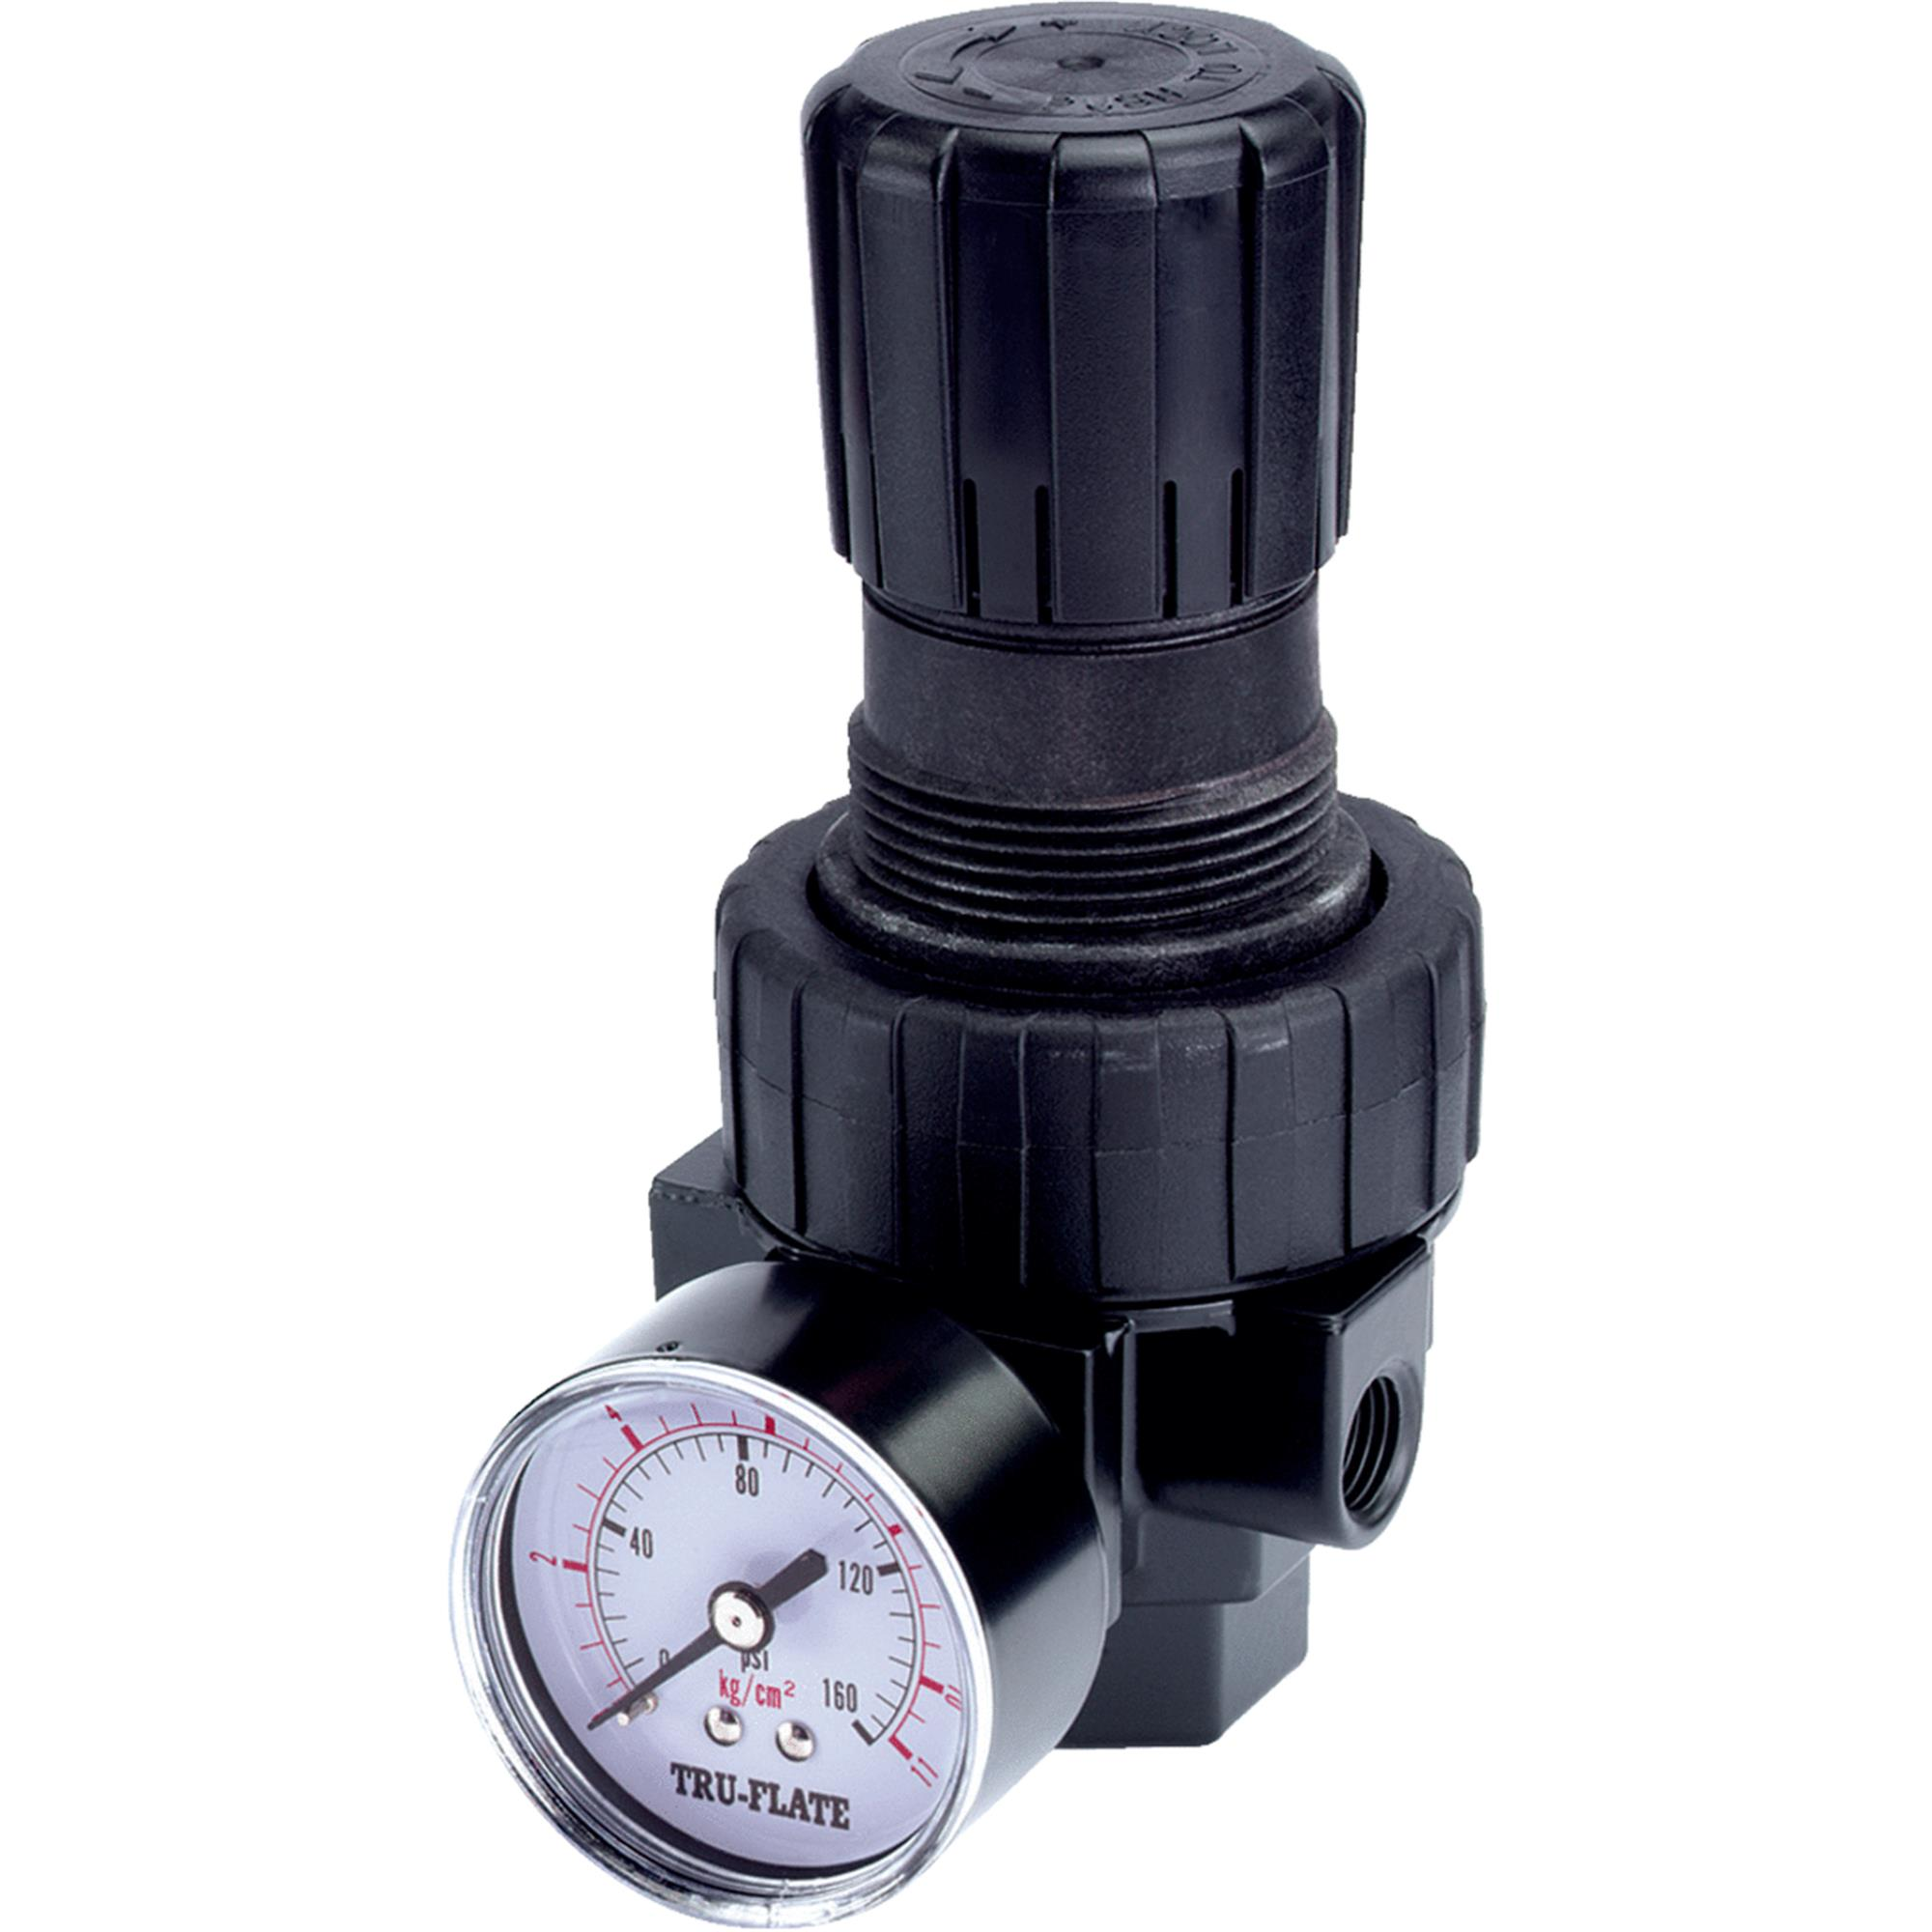 "Plews And Edelman Tomkins 24-414 3/8"" NPTF Pressure Regulator with Gauge"